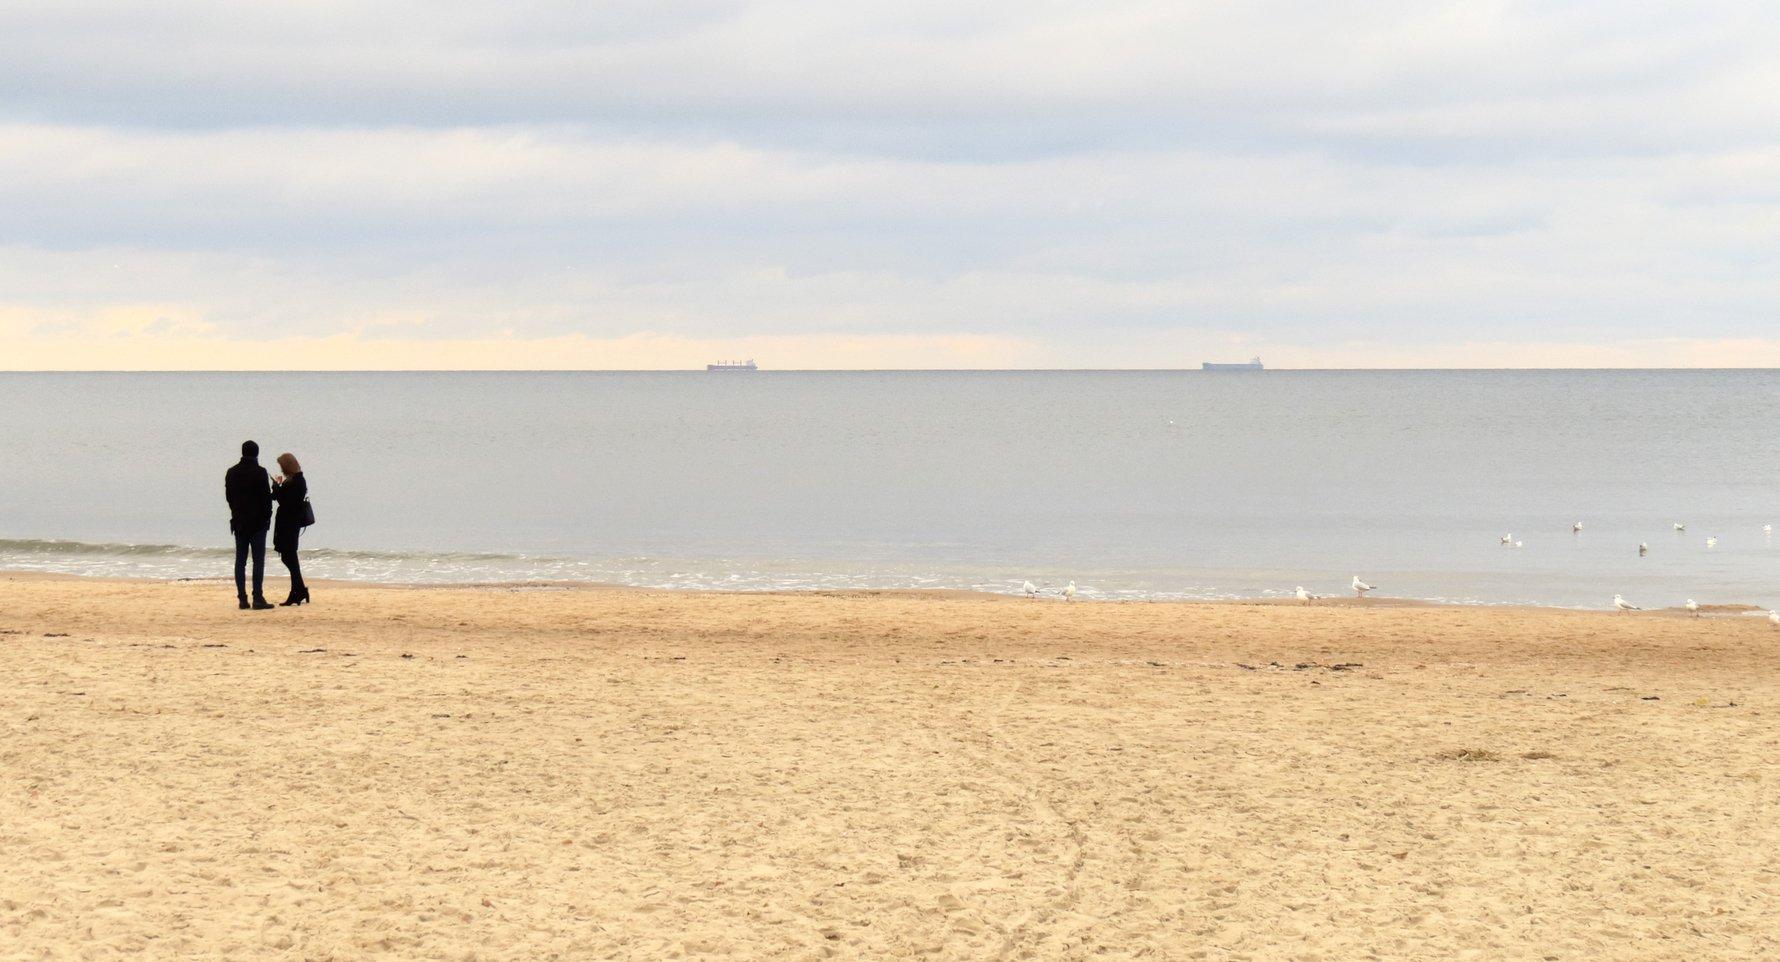 Jelitkowo Beach, Gdańsk